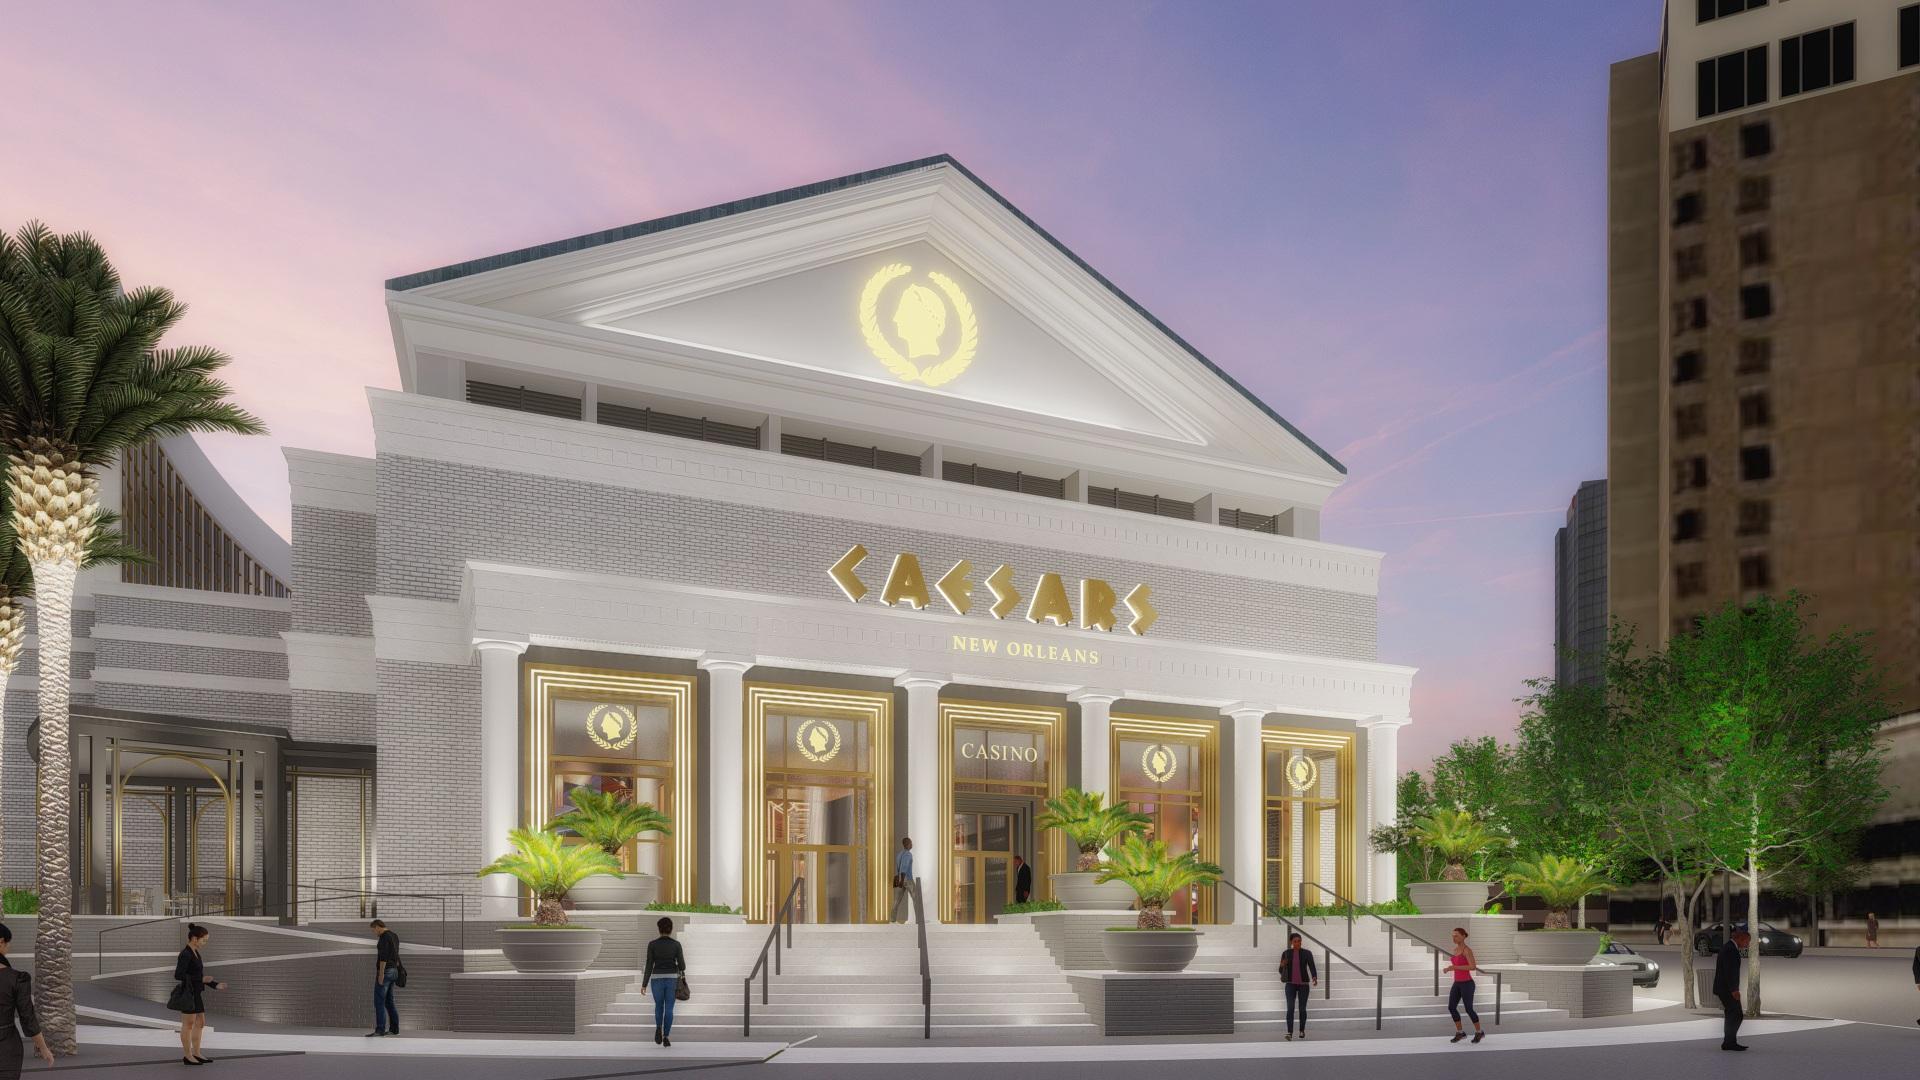 Gebäude Caesars New Orleans